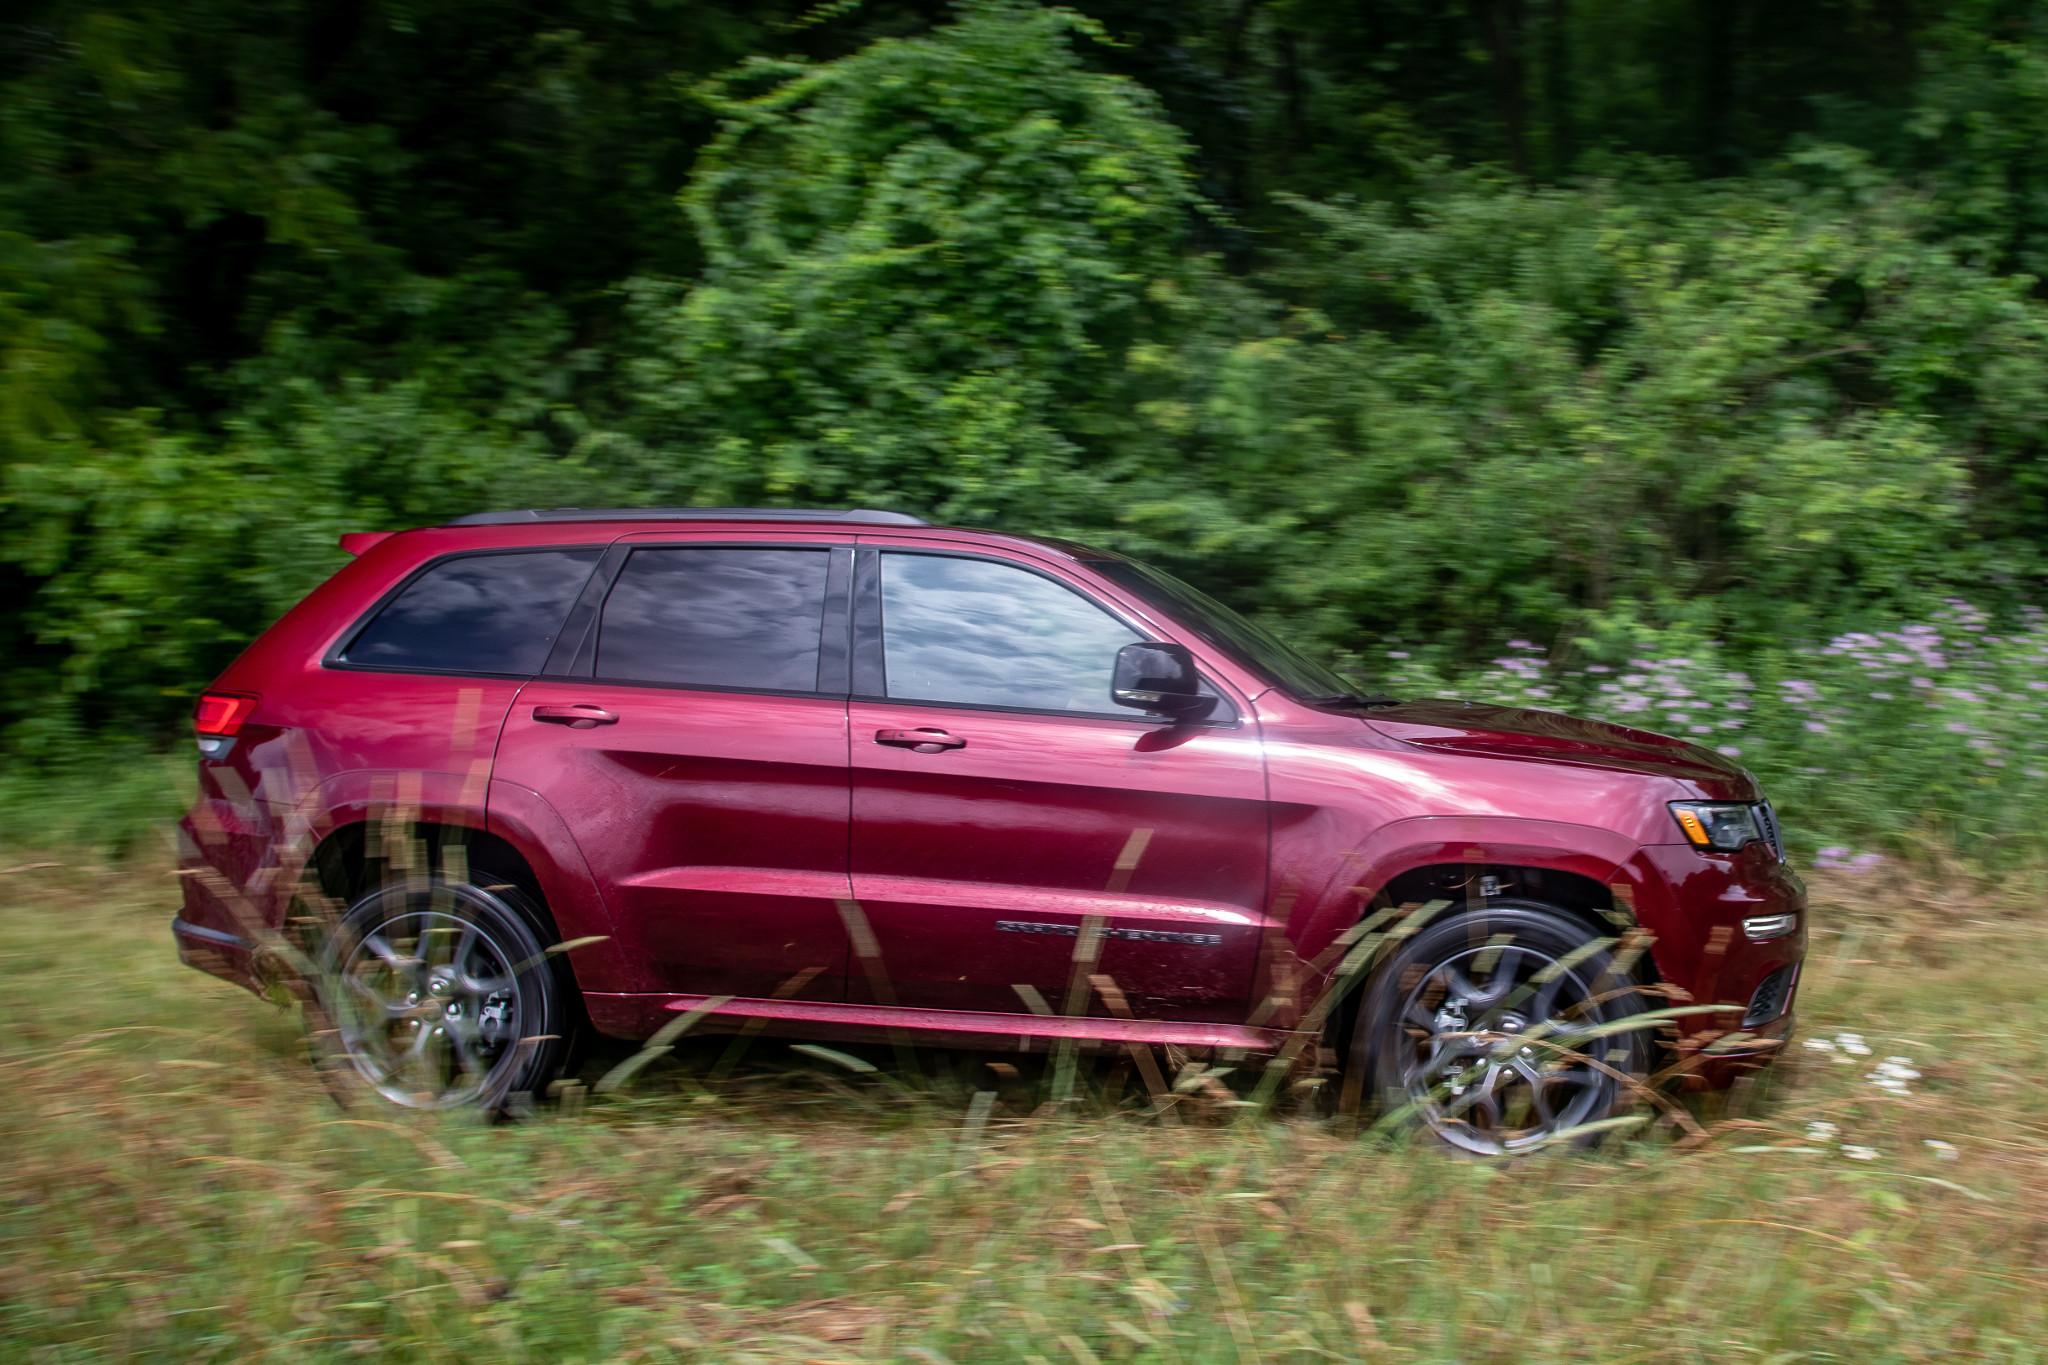 jeep-grand-cherokee-2019-03-exterior--red.jpg